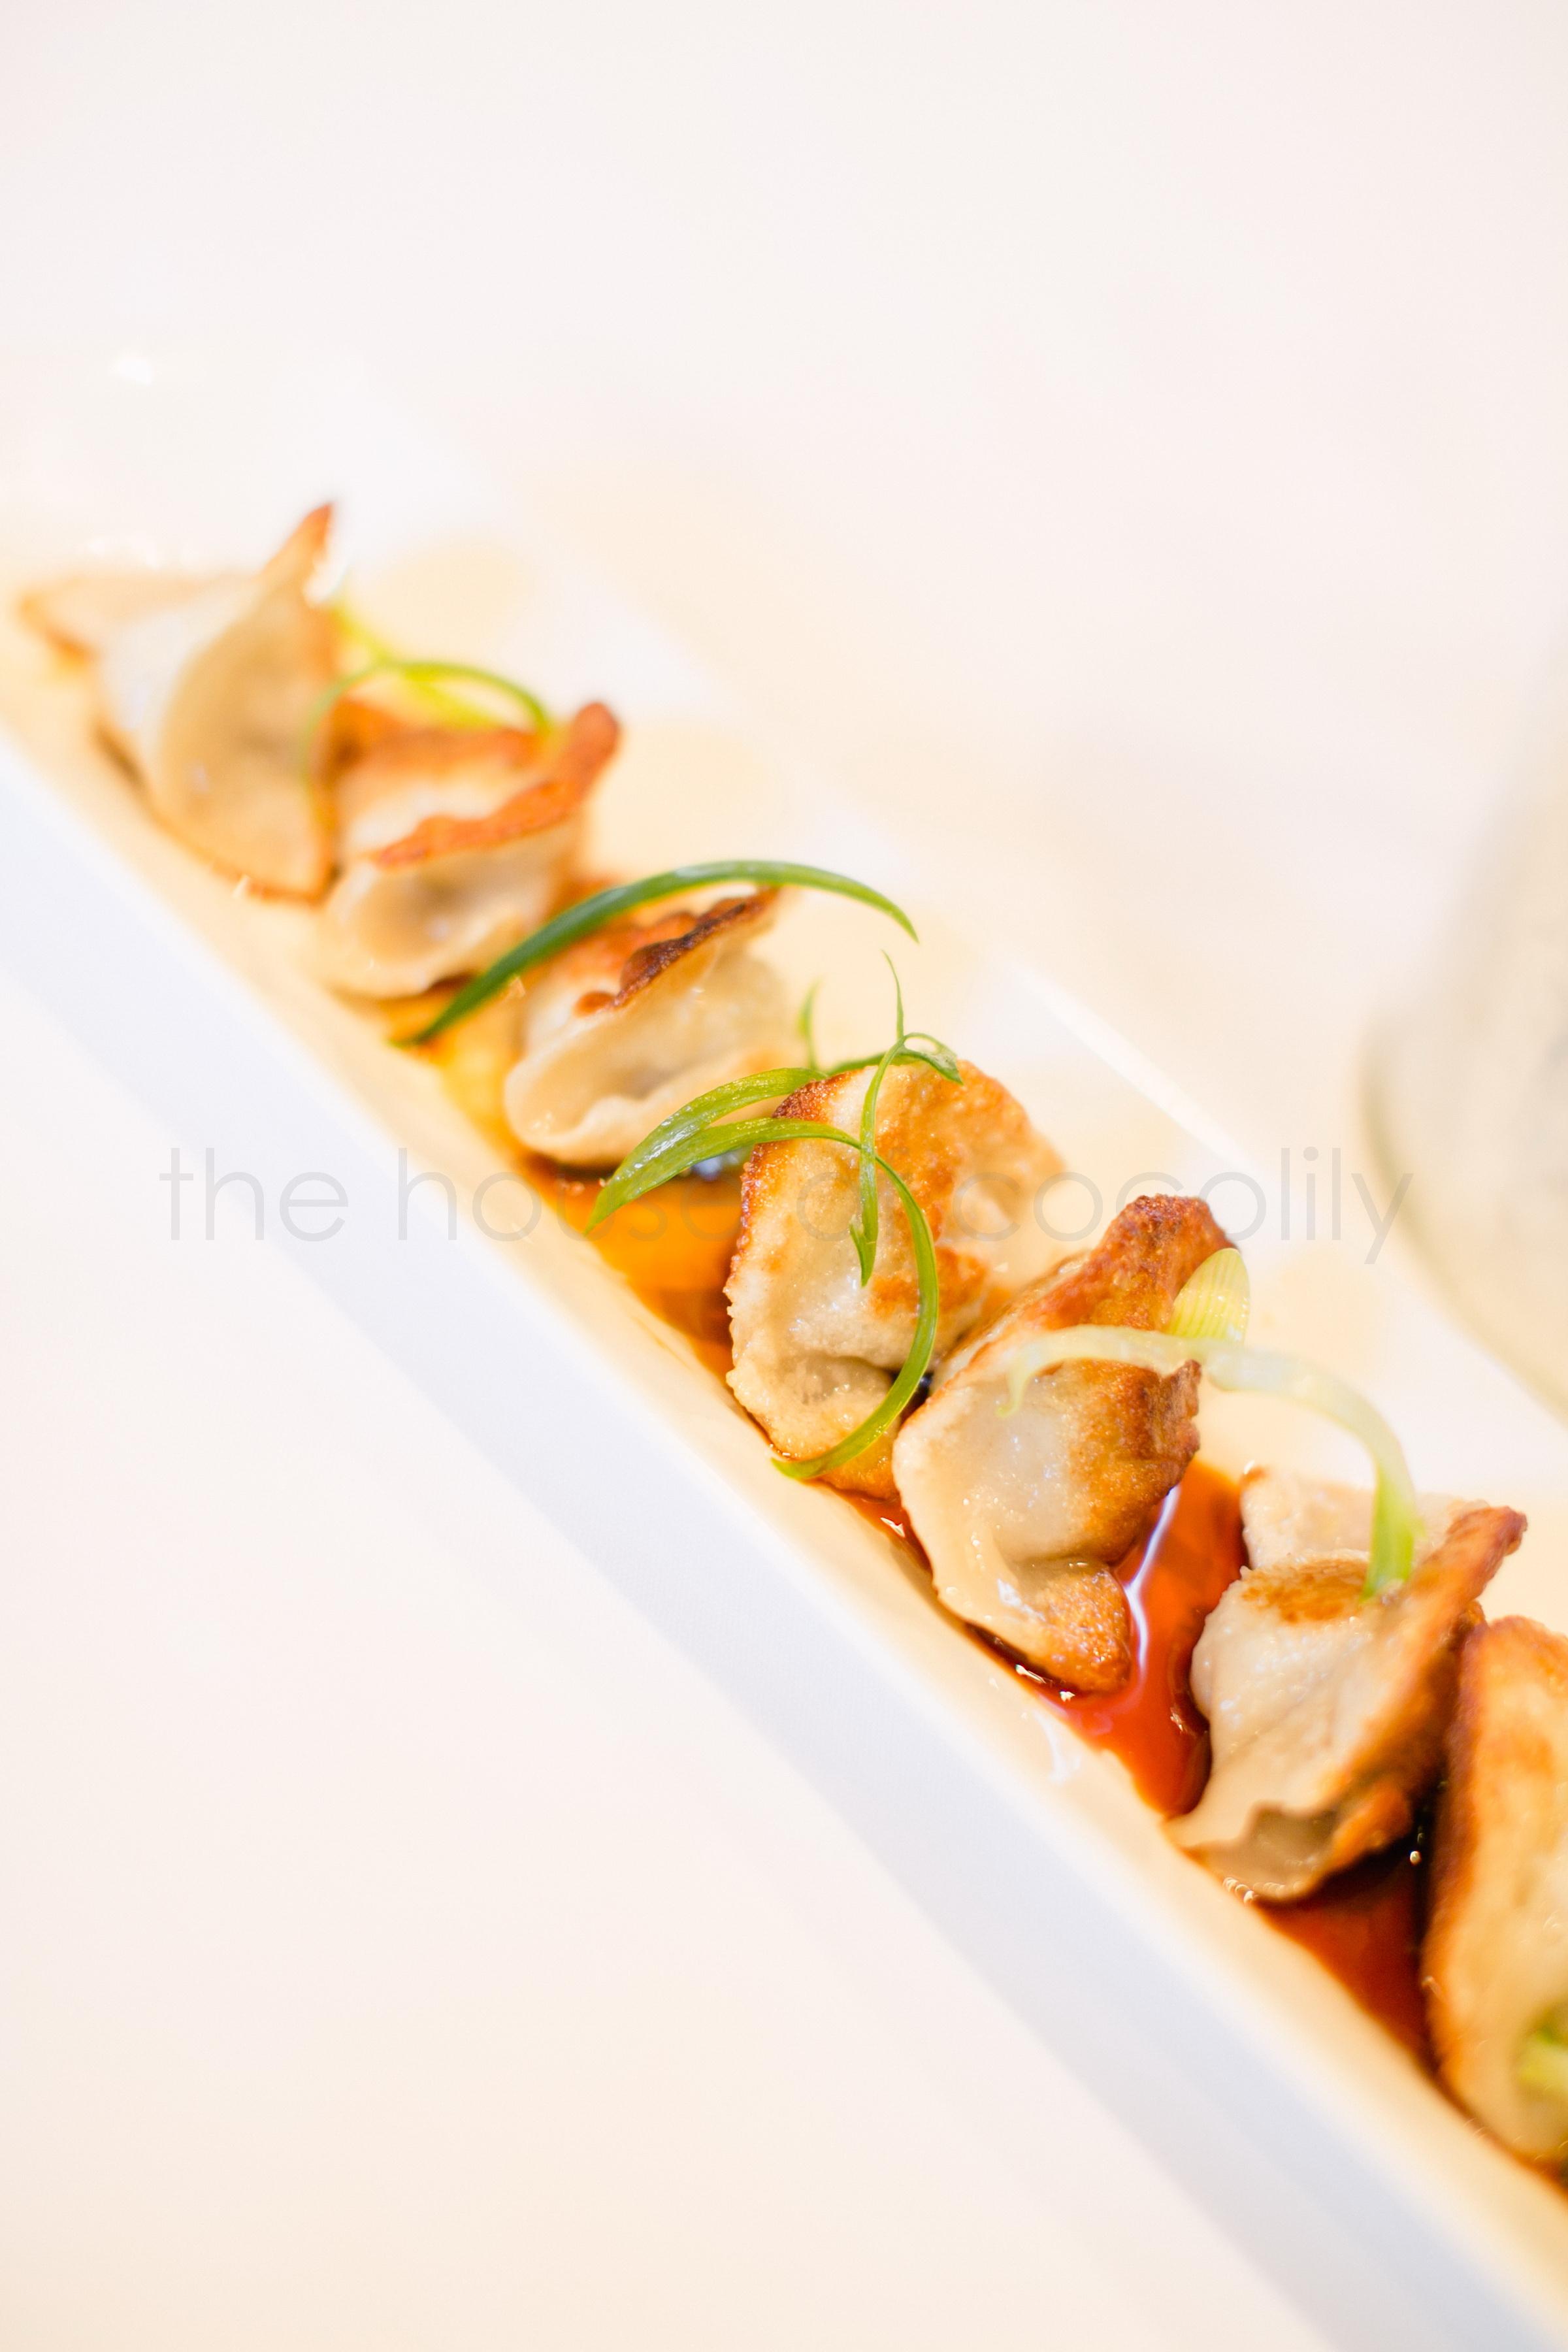 WM-marketing-branding-photography-catering-restaurants-chefs-headshots-food-corporate (3).jpg